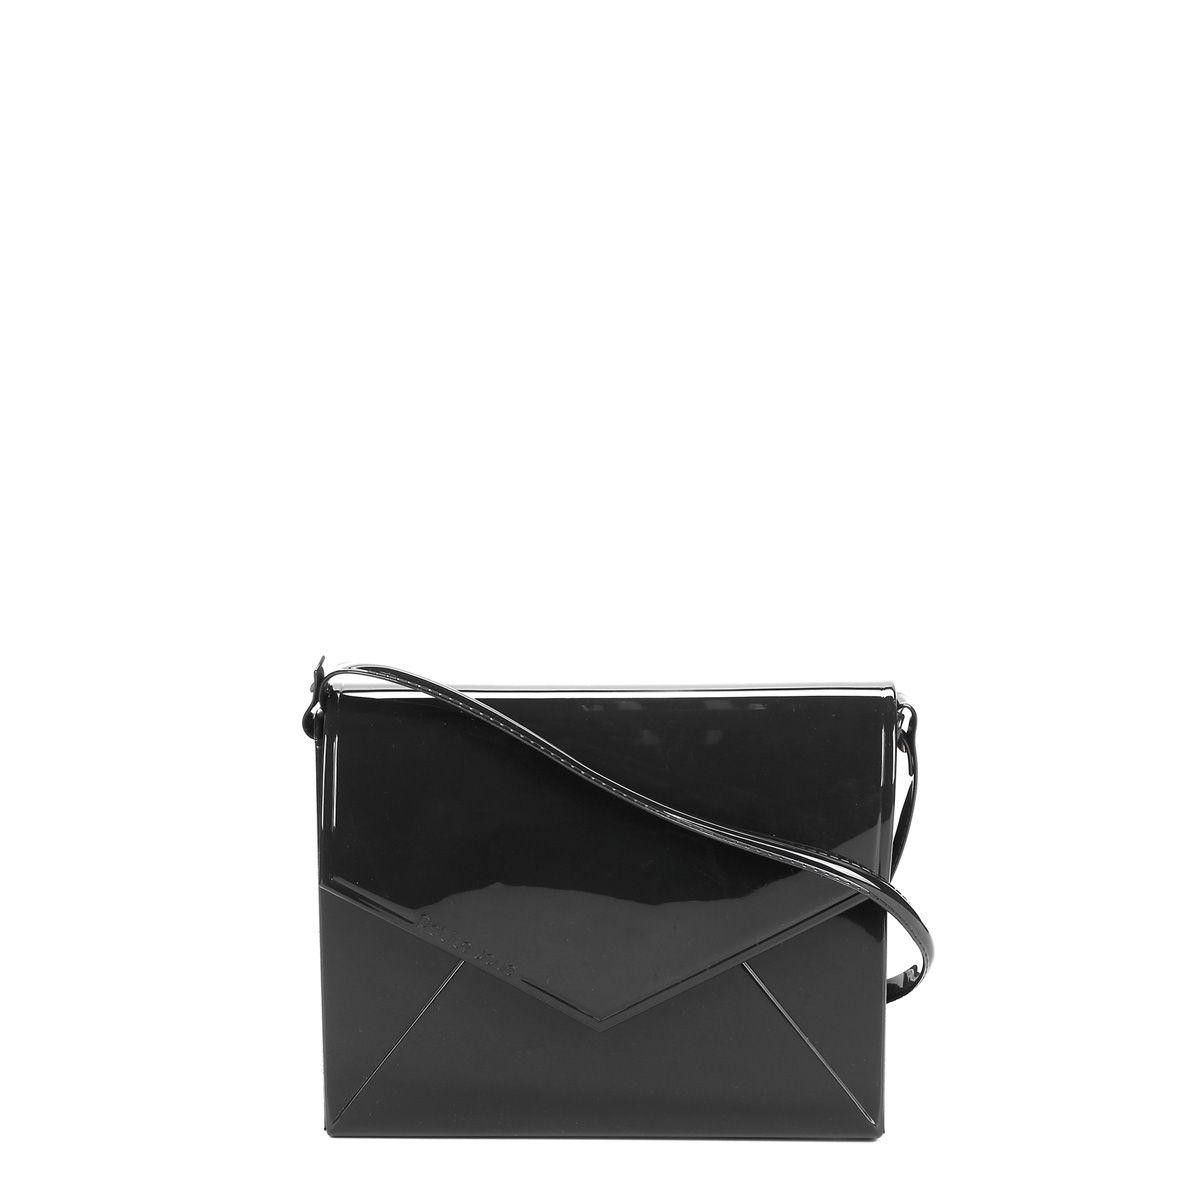 a304f14ae Bolsa Petite Jolie Mini Bag Feminina - Preto - Compre Agora | Zattini